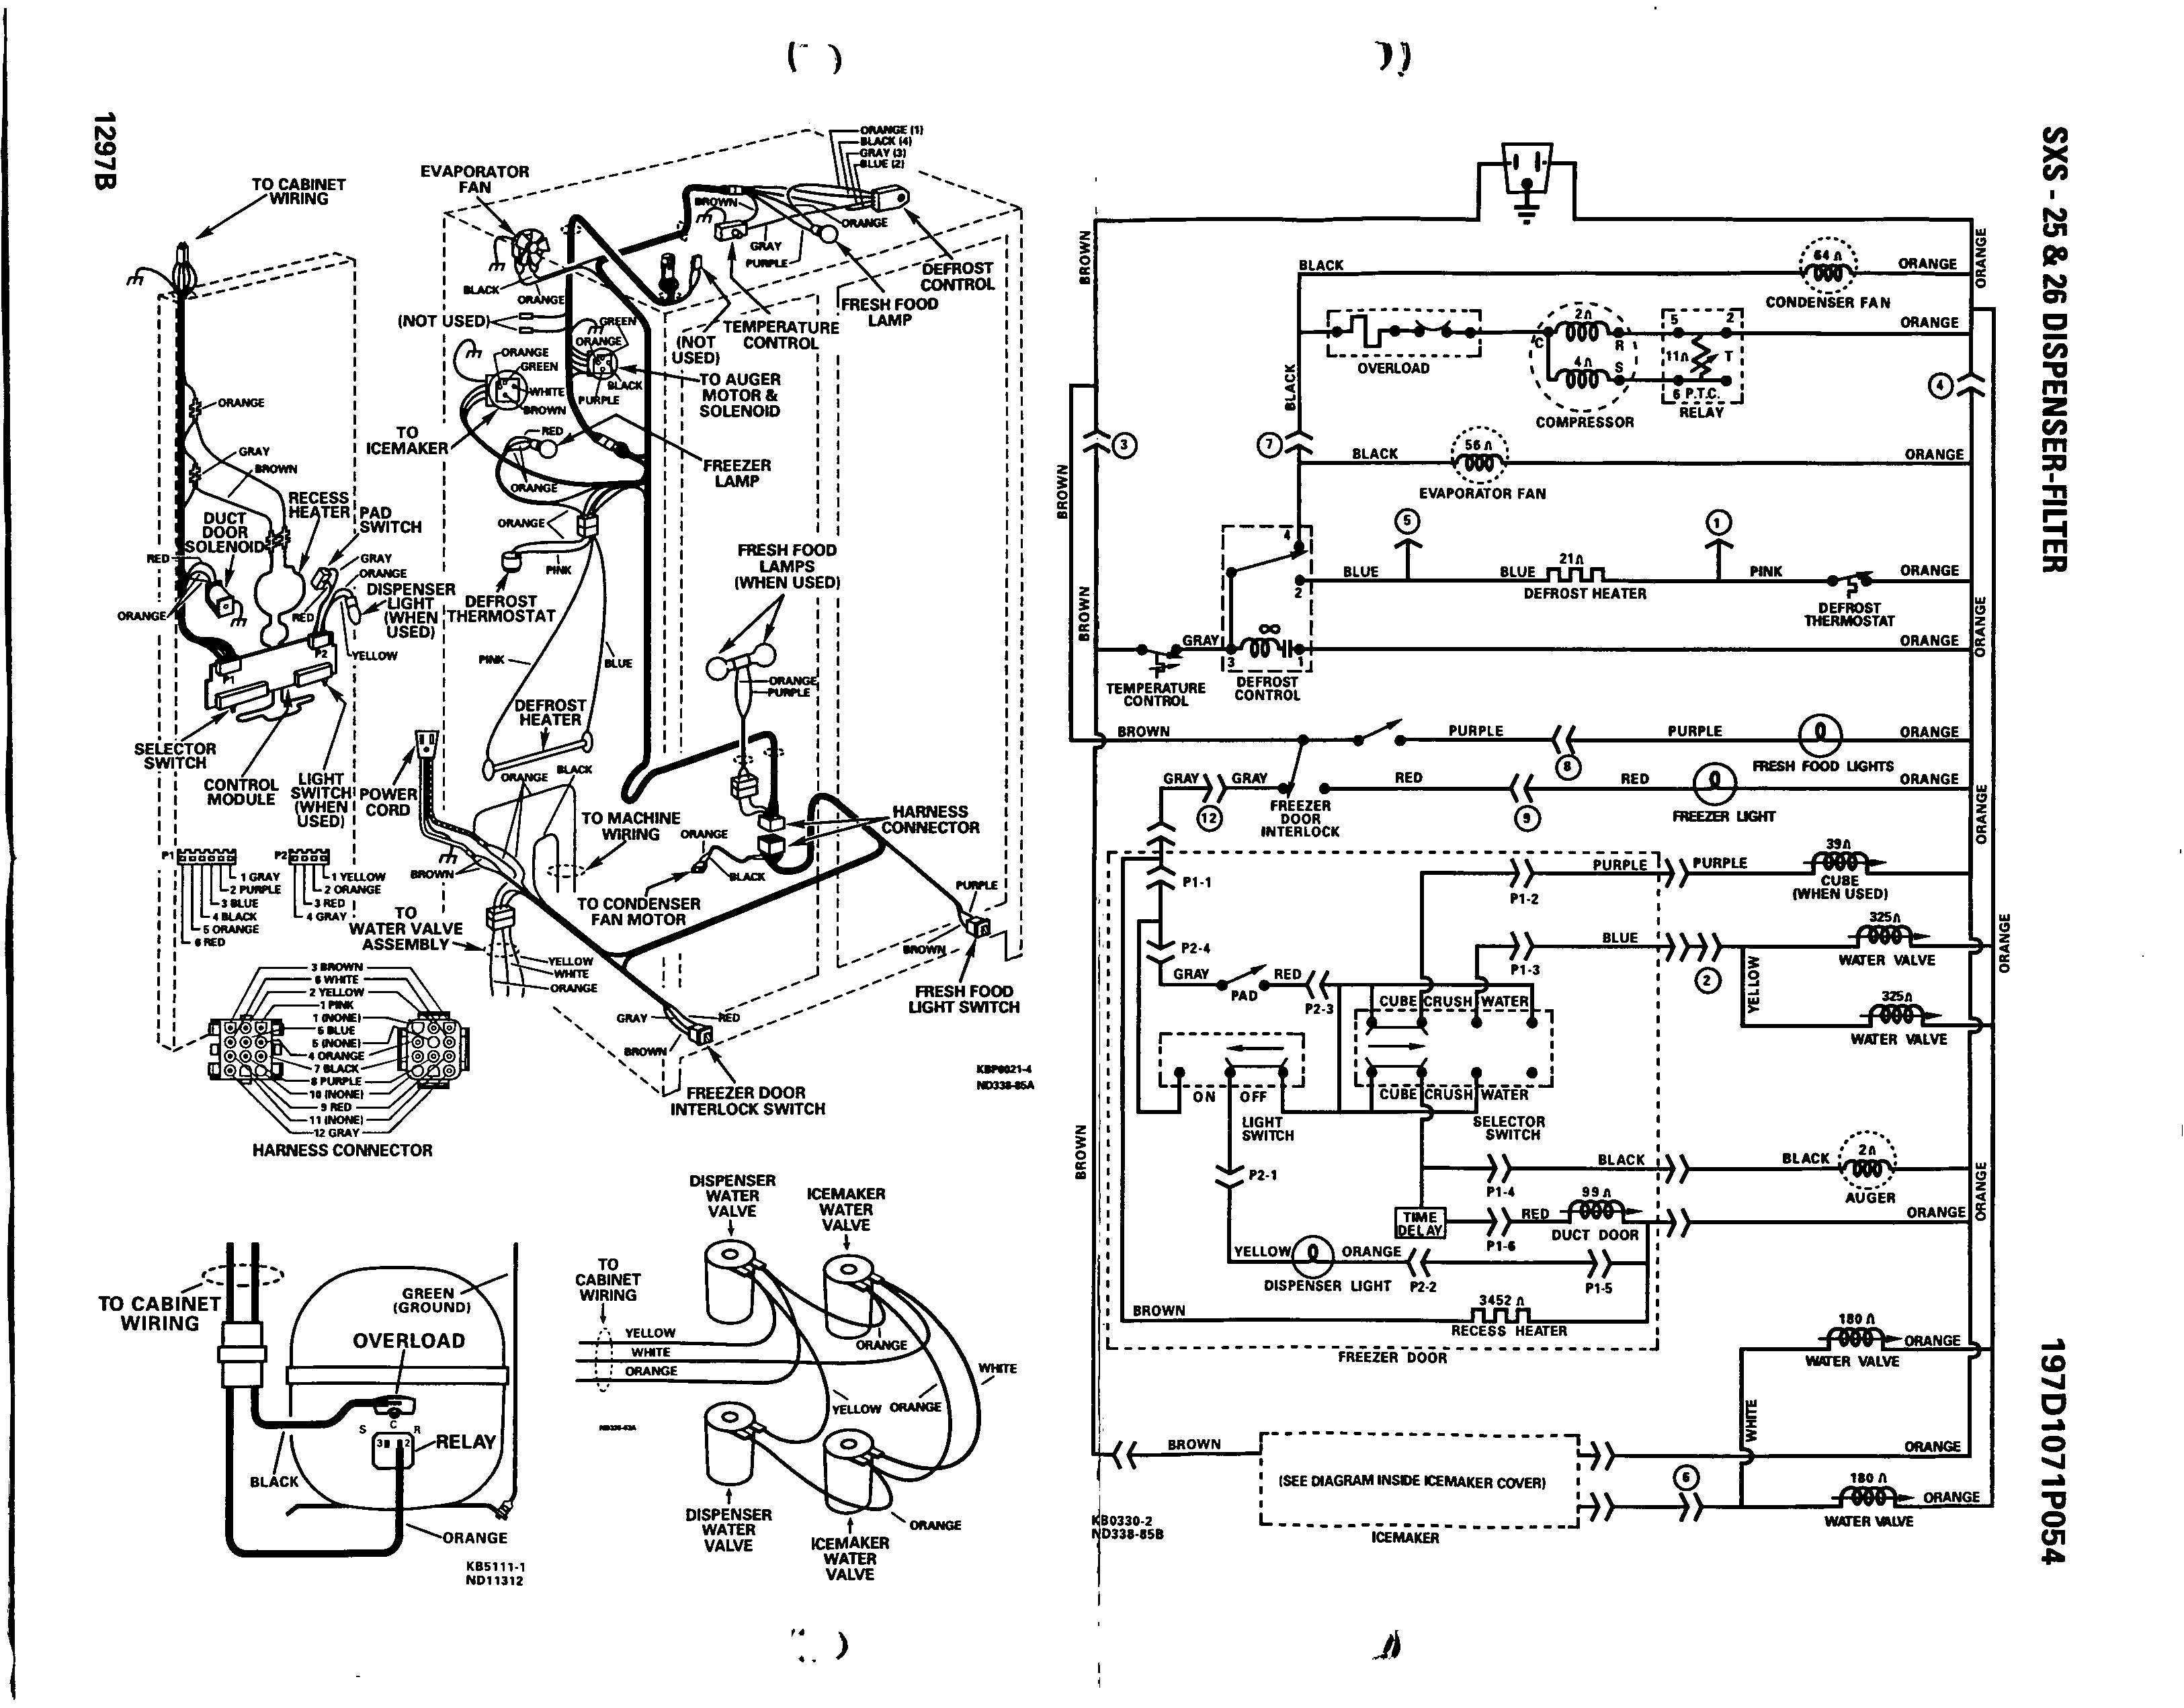 whirlpool conquest refrigerator wiring diagram wiring diagram Basic Wiring Diagram